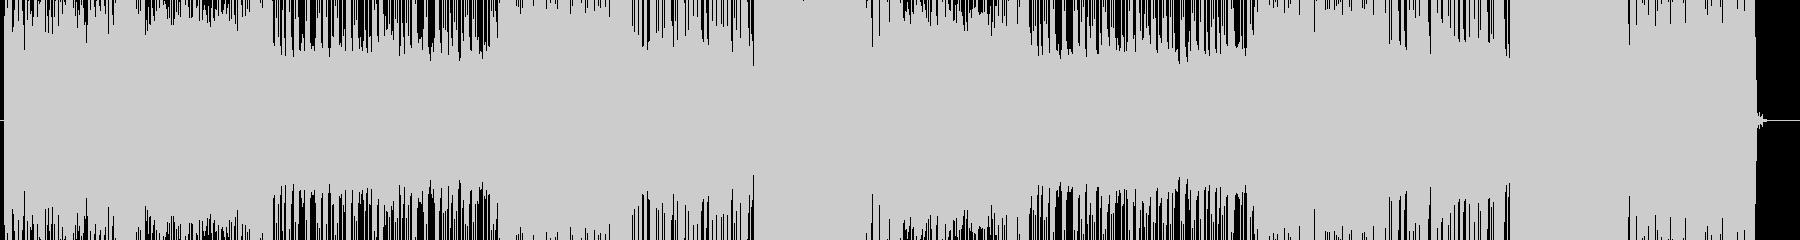 「HR/HM」「DEATH」BGM94の未再生の波形